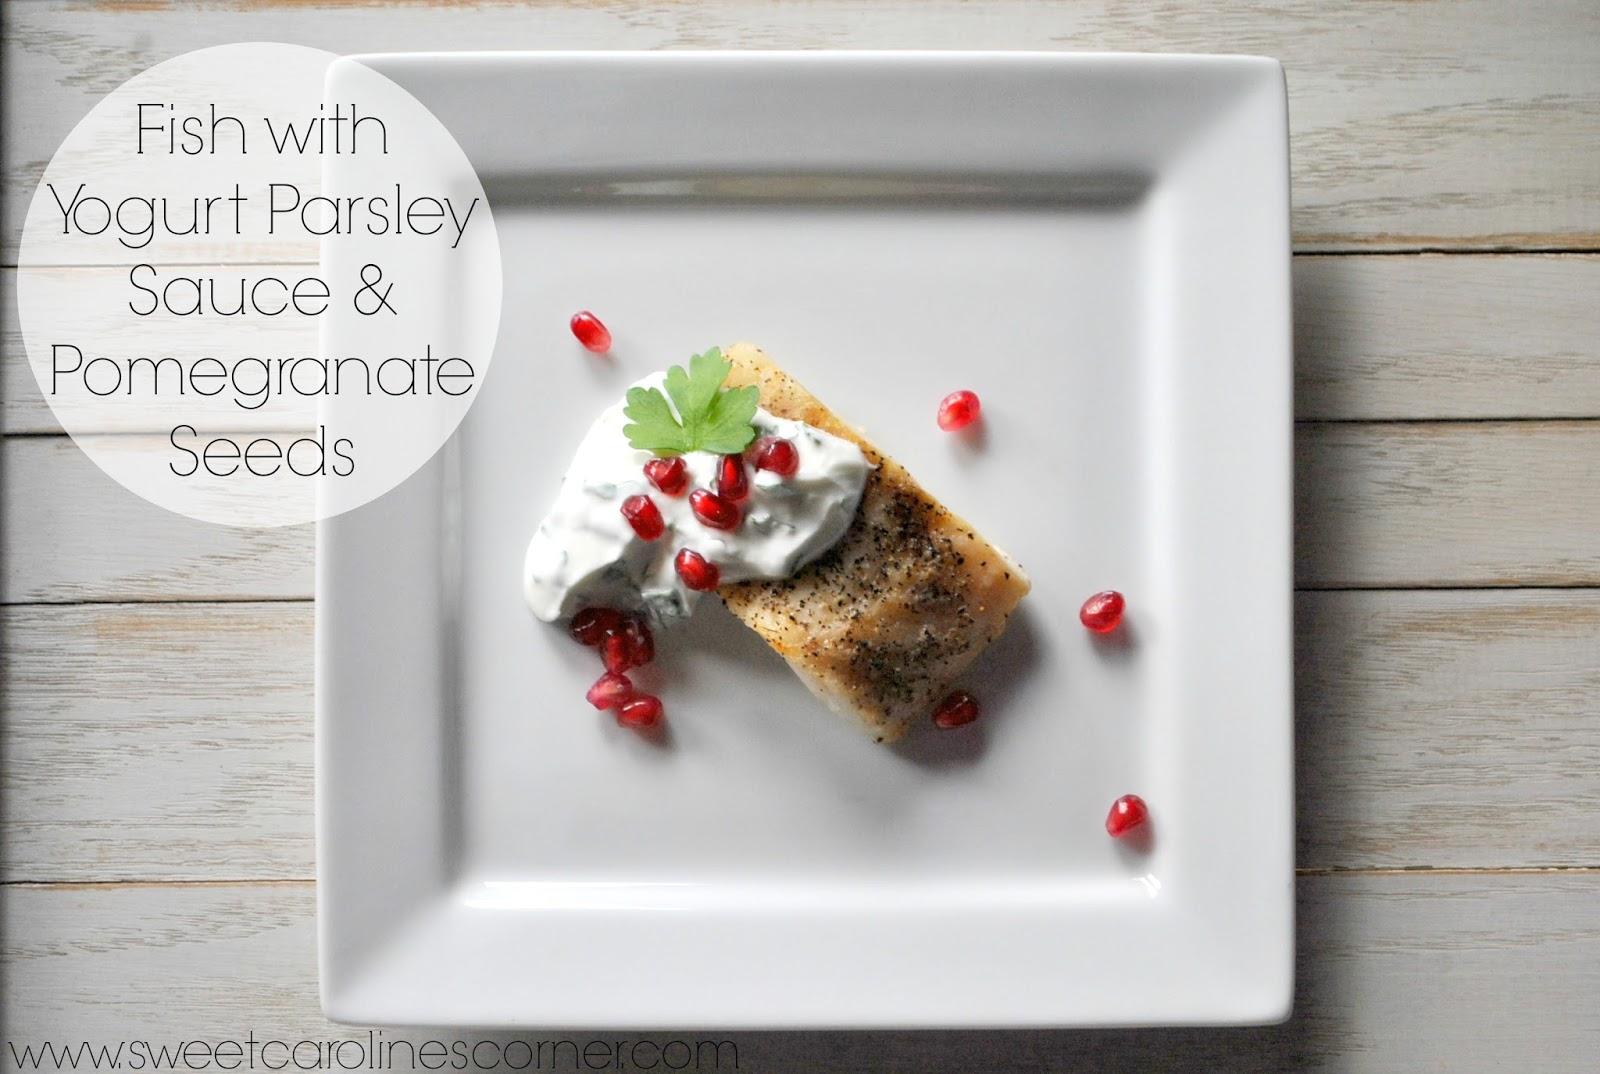 Sweet Caroline's Corner: Fish with Yogurt Parsley Sauce & Pomegranate...